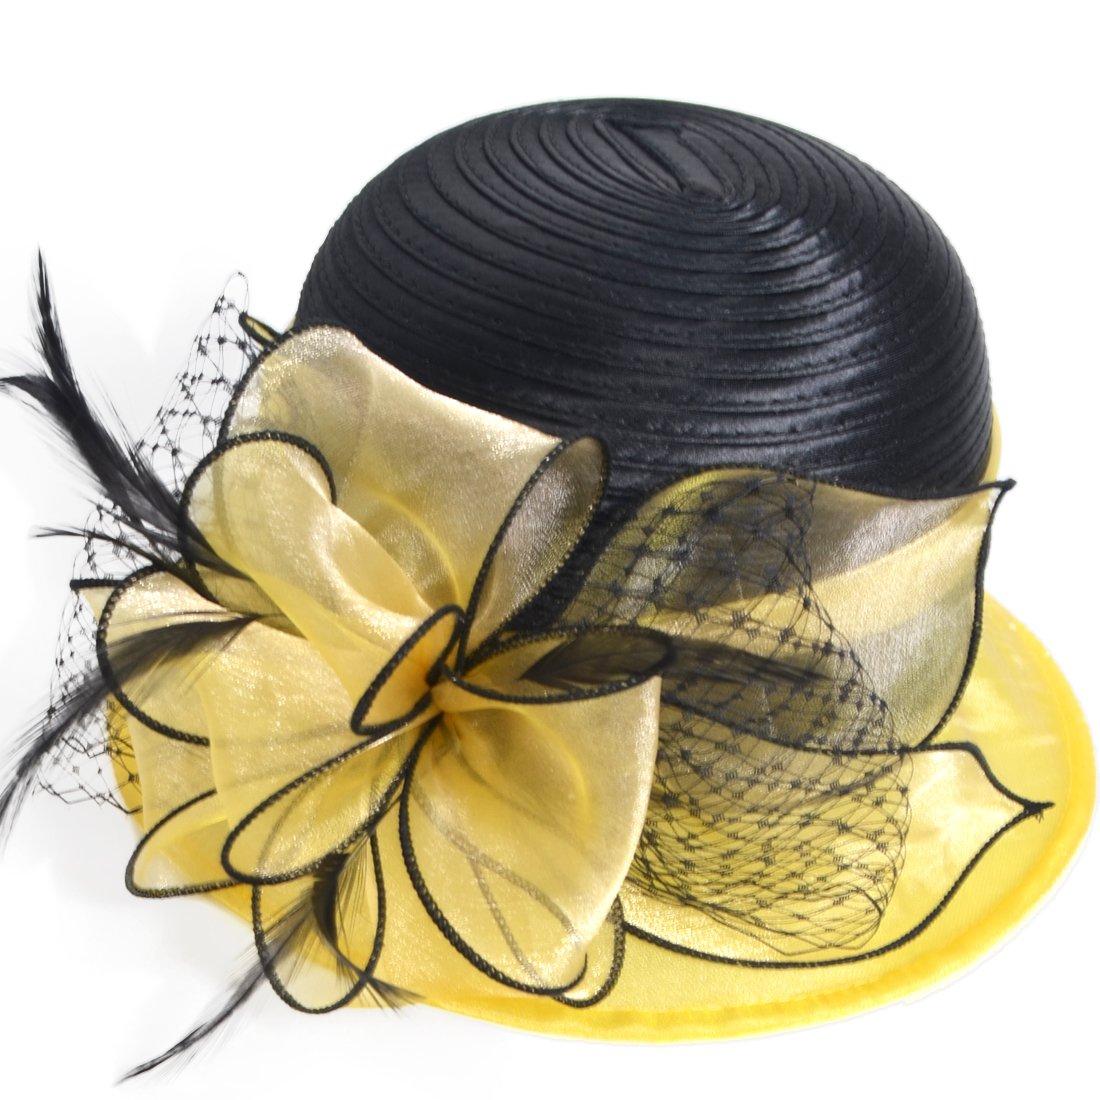 HISSHE Sweet Cute Cloche Oaks Church Dress Bowler Derby Wedding Hat Party S606-A, Yellow, Medium by HISSHE (Image #2)